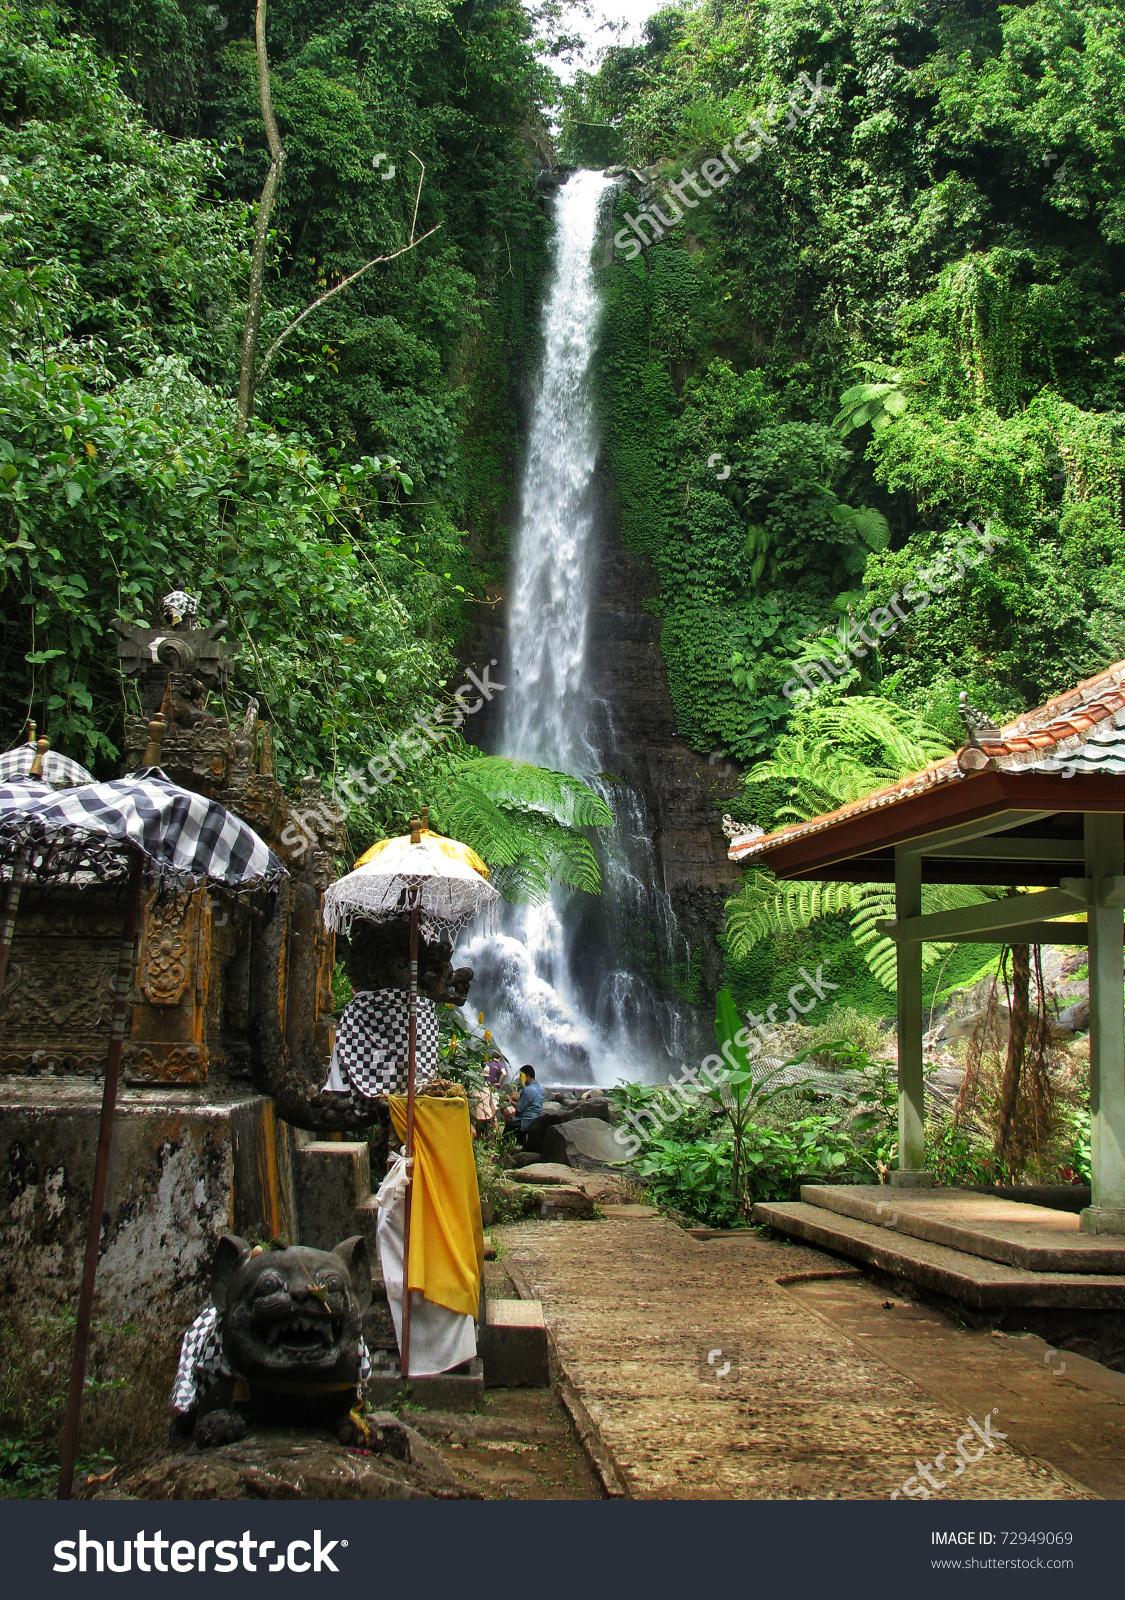 Bali: Impressive Gitgit Waterfalls, Surrounded By Beautiful Wild.